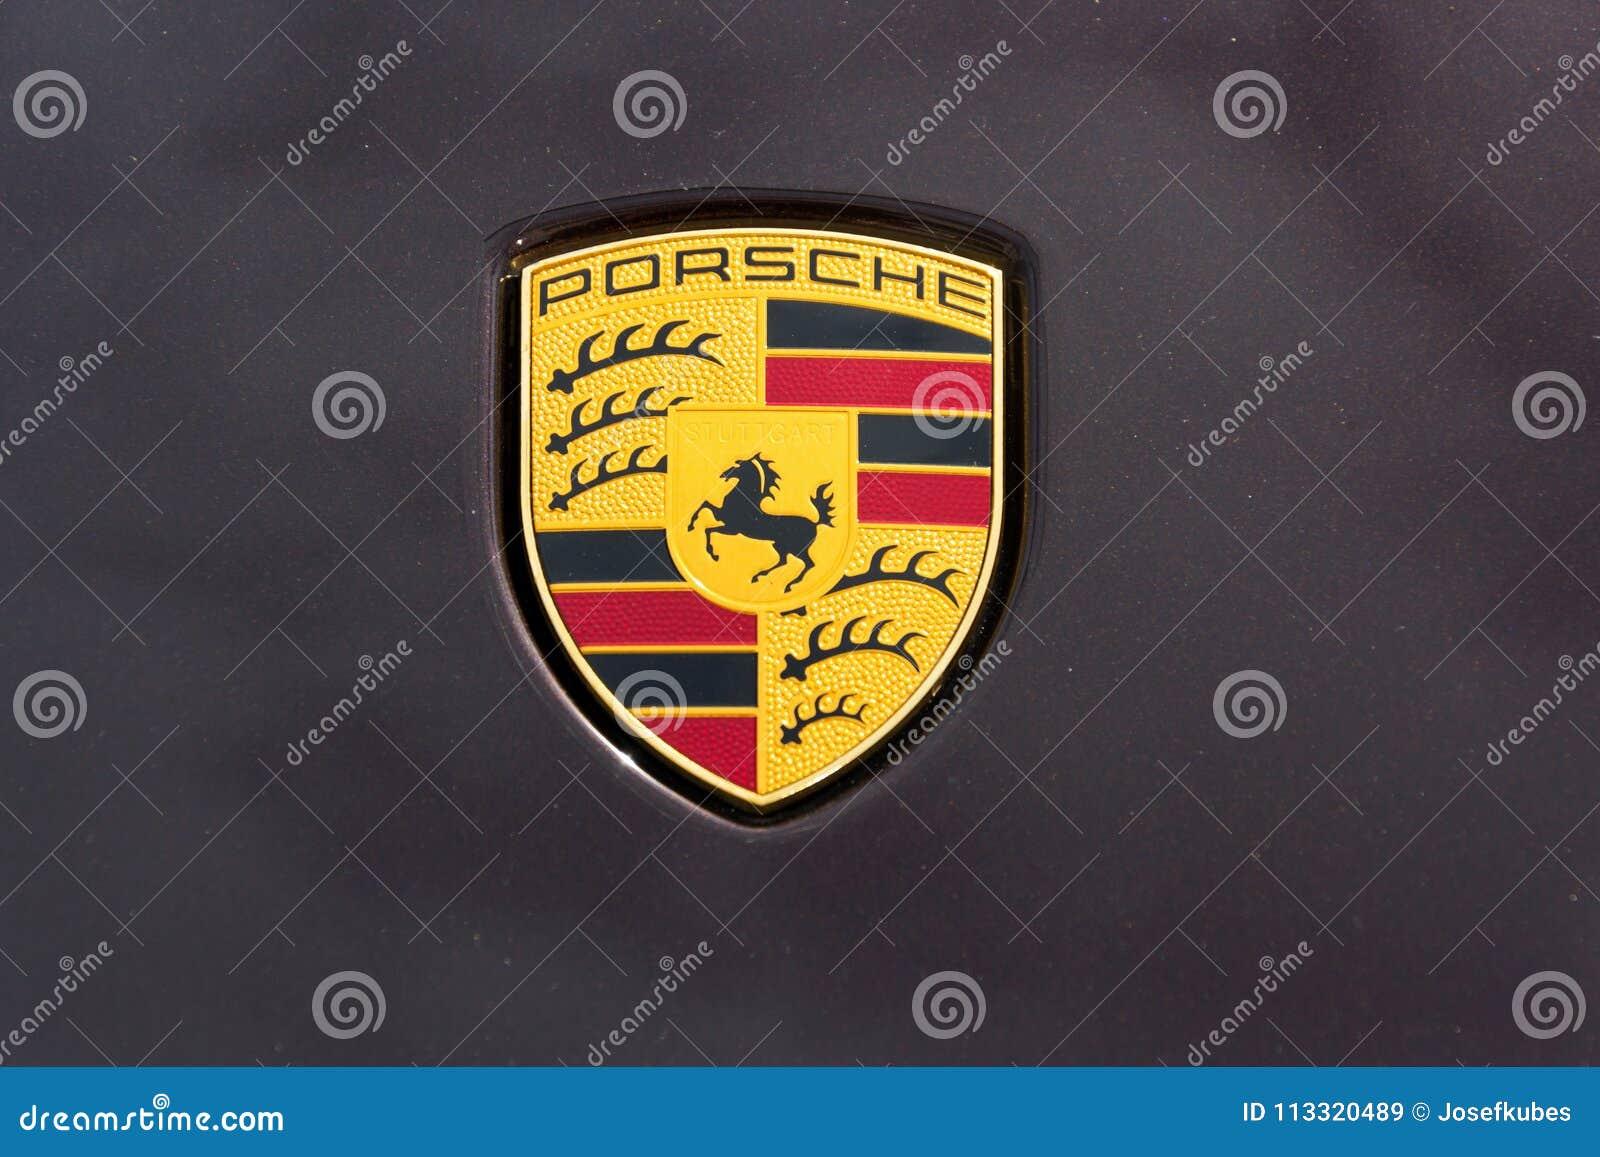 Porsche Automotive Company Logo On Car Bonnet Editorial Stock Image